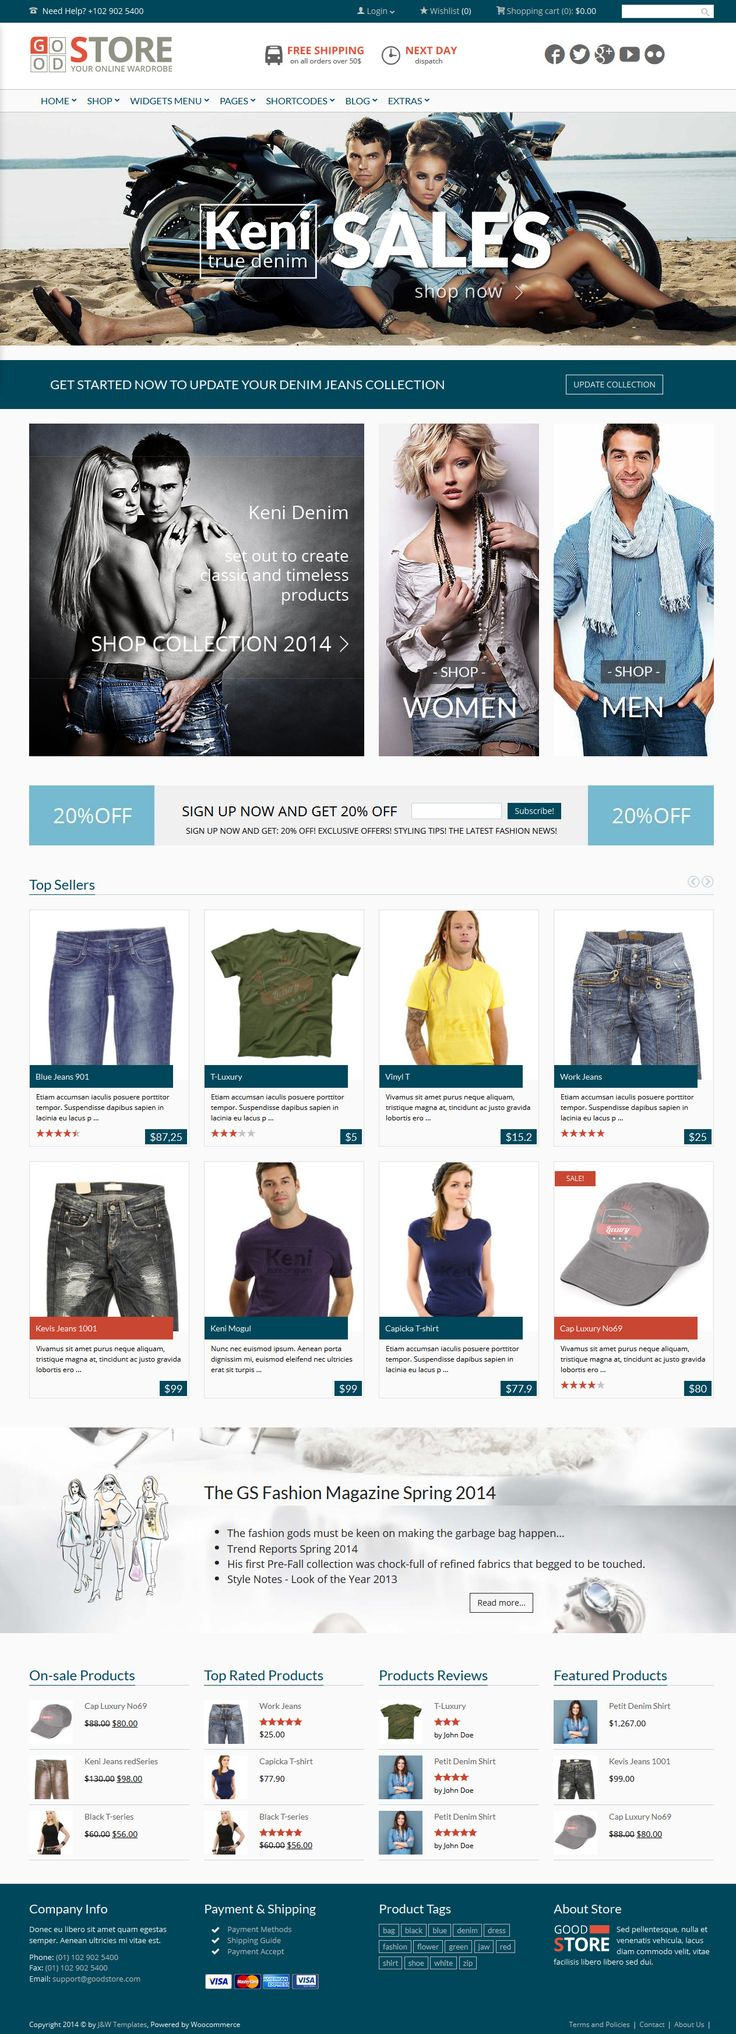 GoodStore from ThemeForest - a stunning wordpress theme.